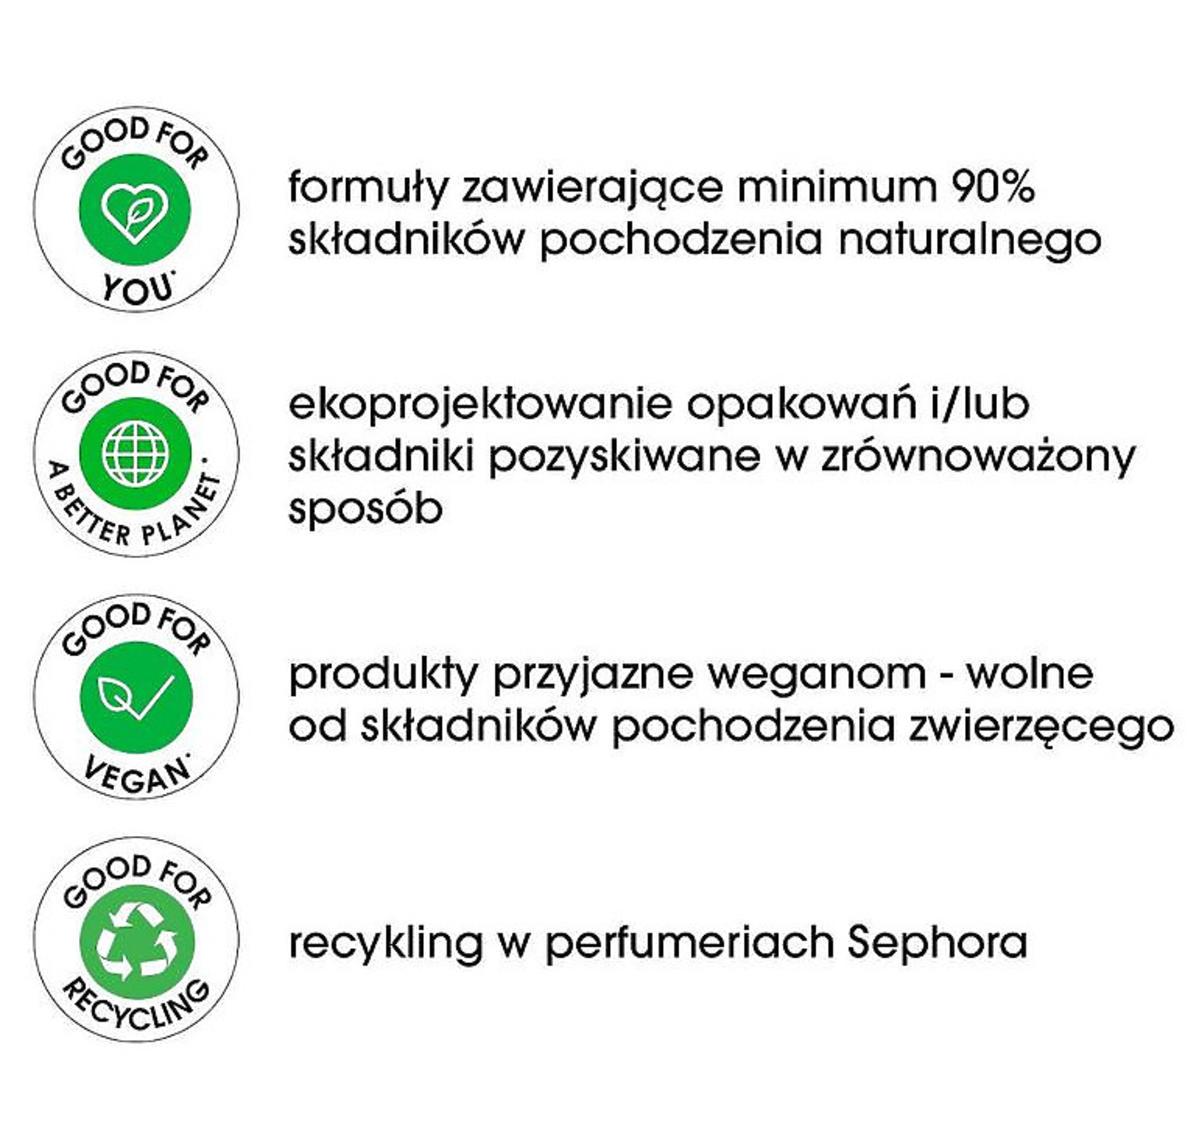 Sephora GOOD FOR - zielone etykiety